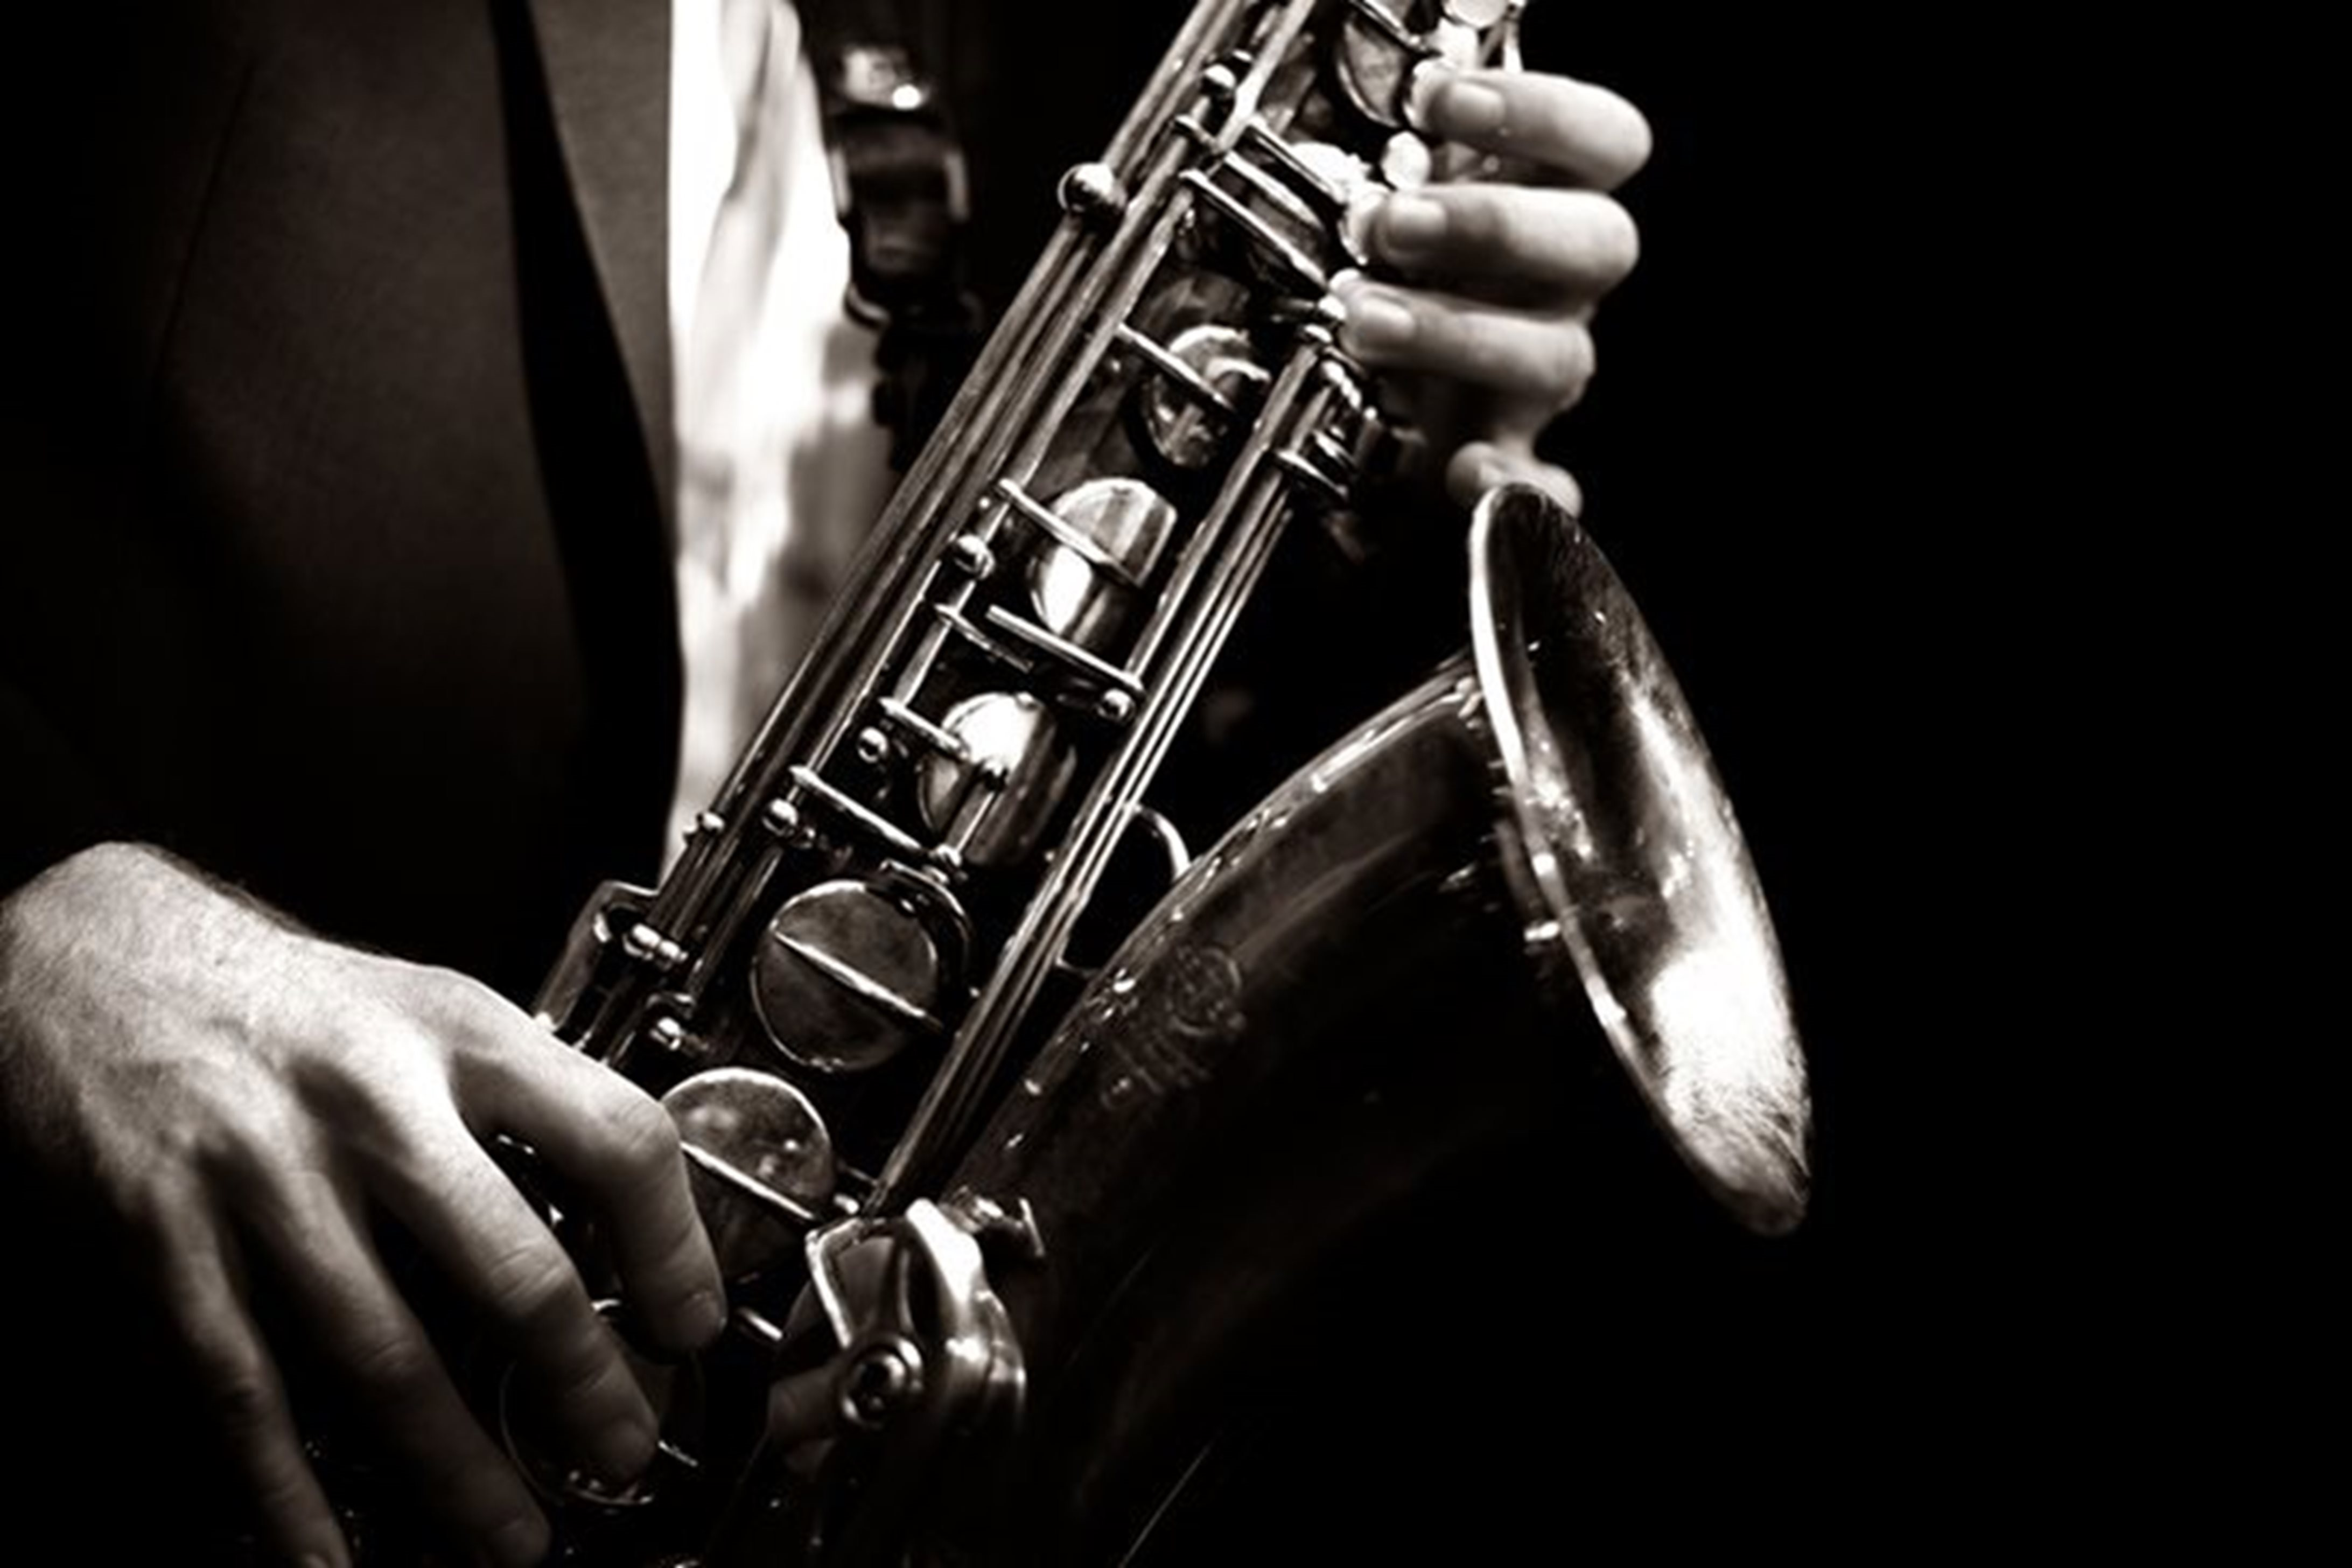 http://www.tarragonmalta.com/wp-content/uploads/2013/10/p-us-prague-international-jazz-festival.jpg